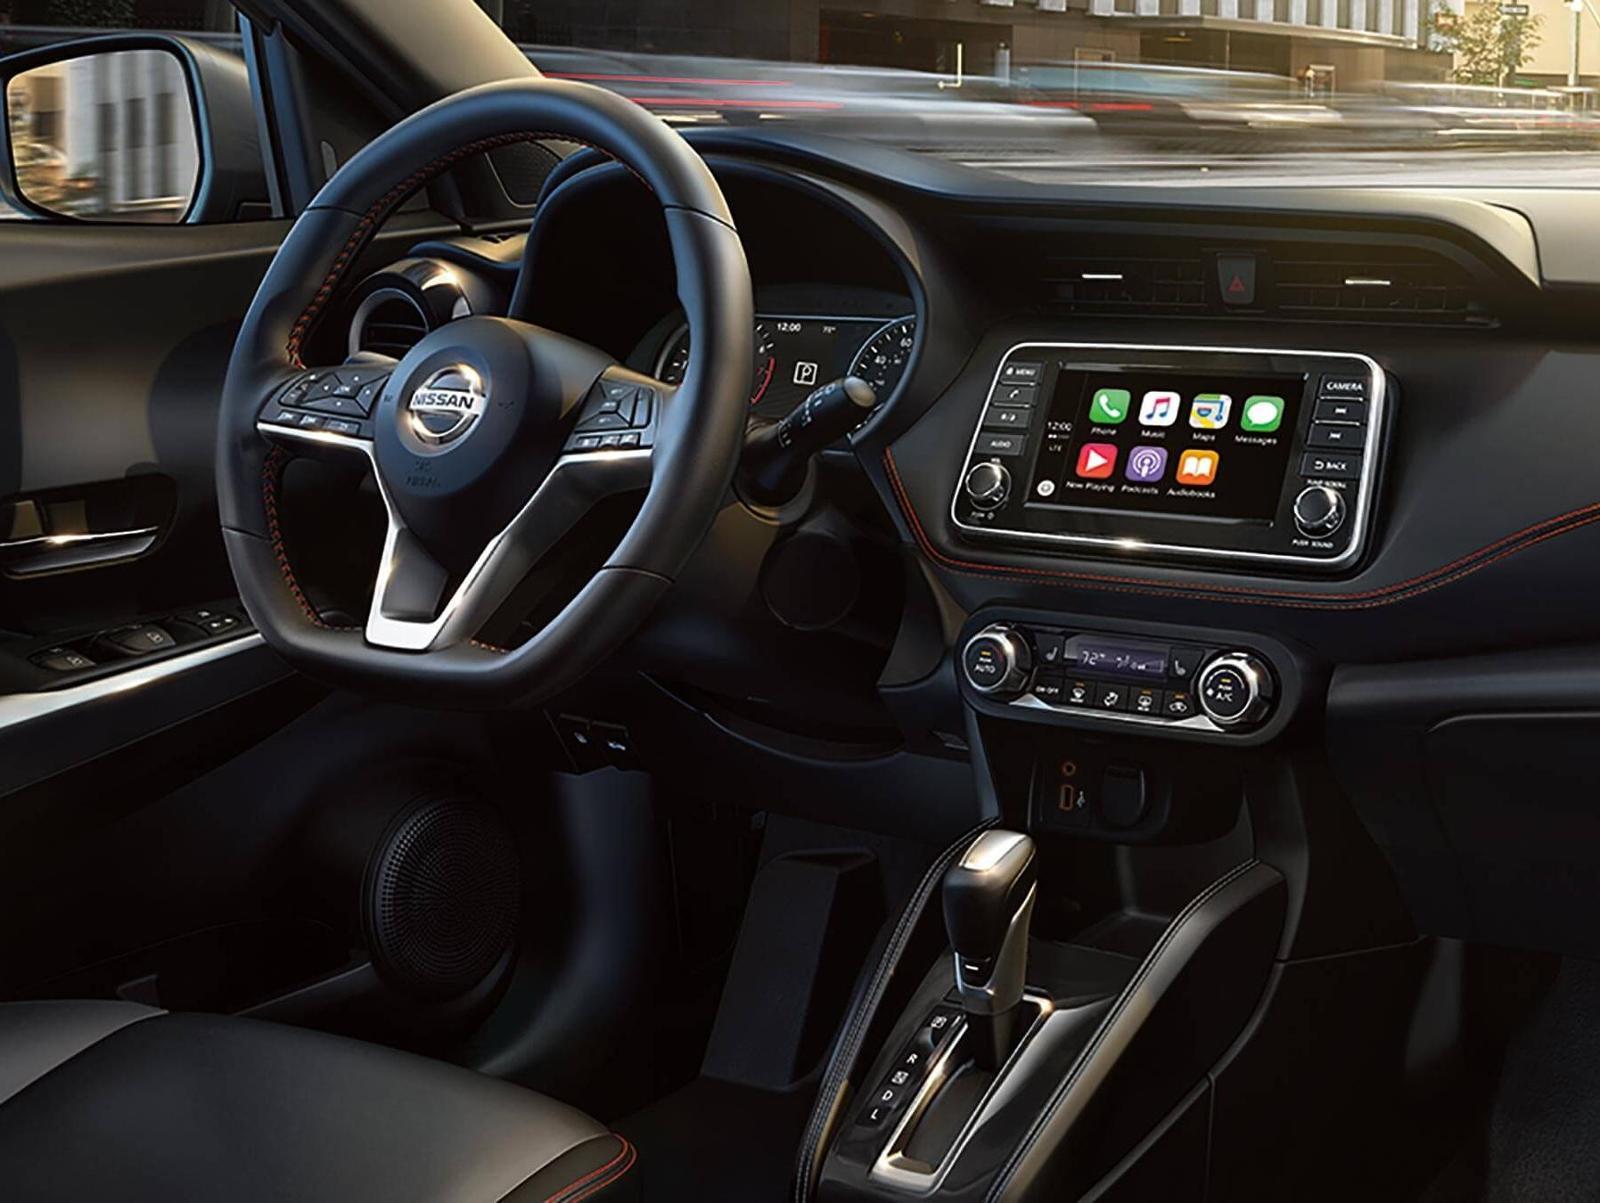 Nissan vehicle interior shot